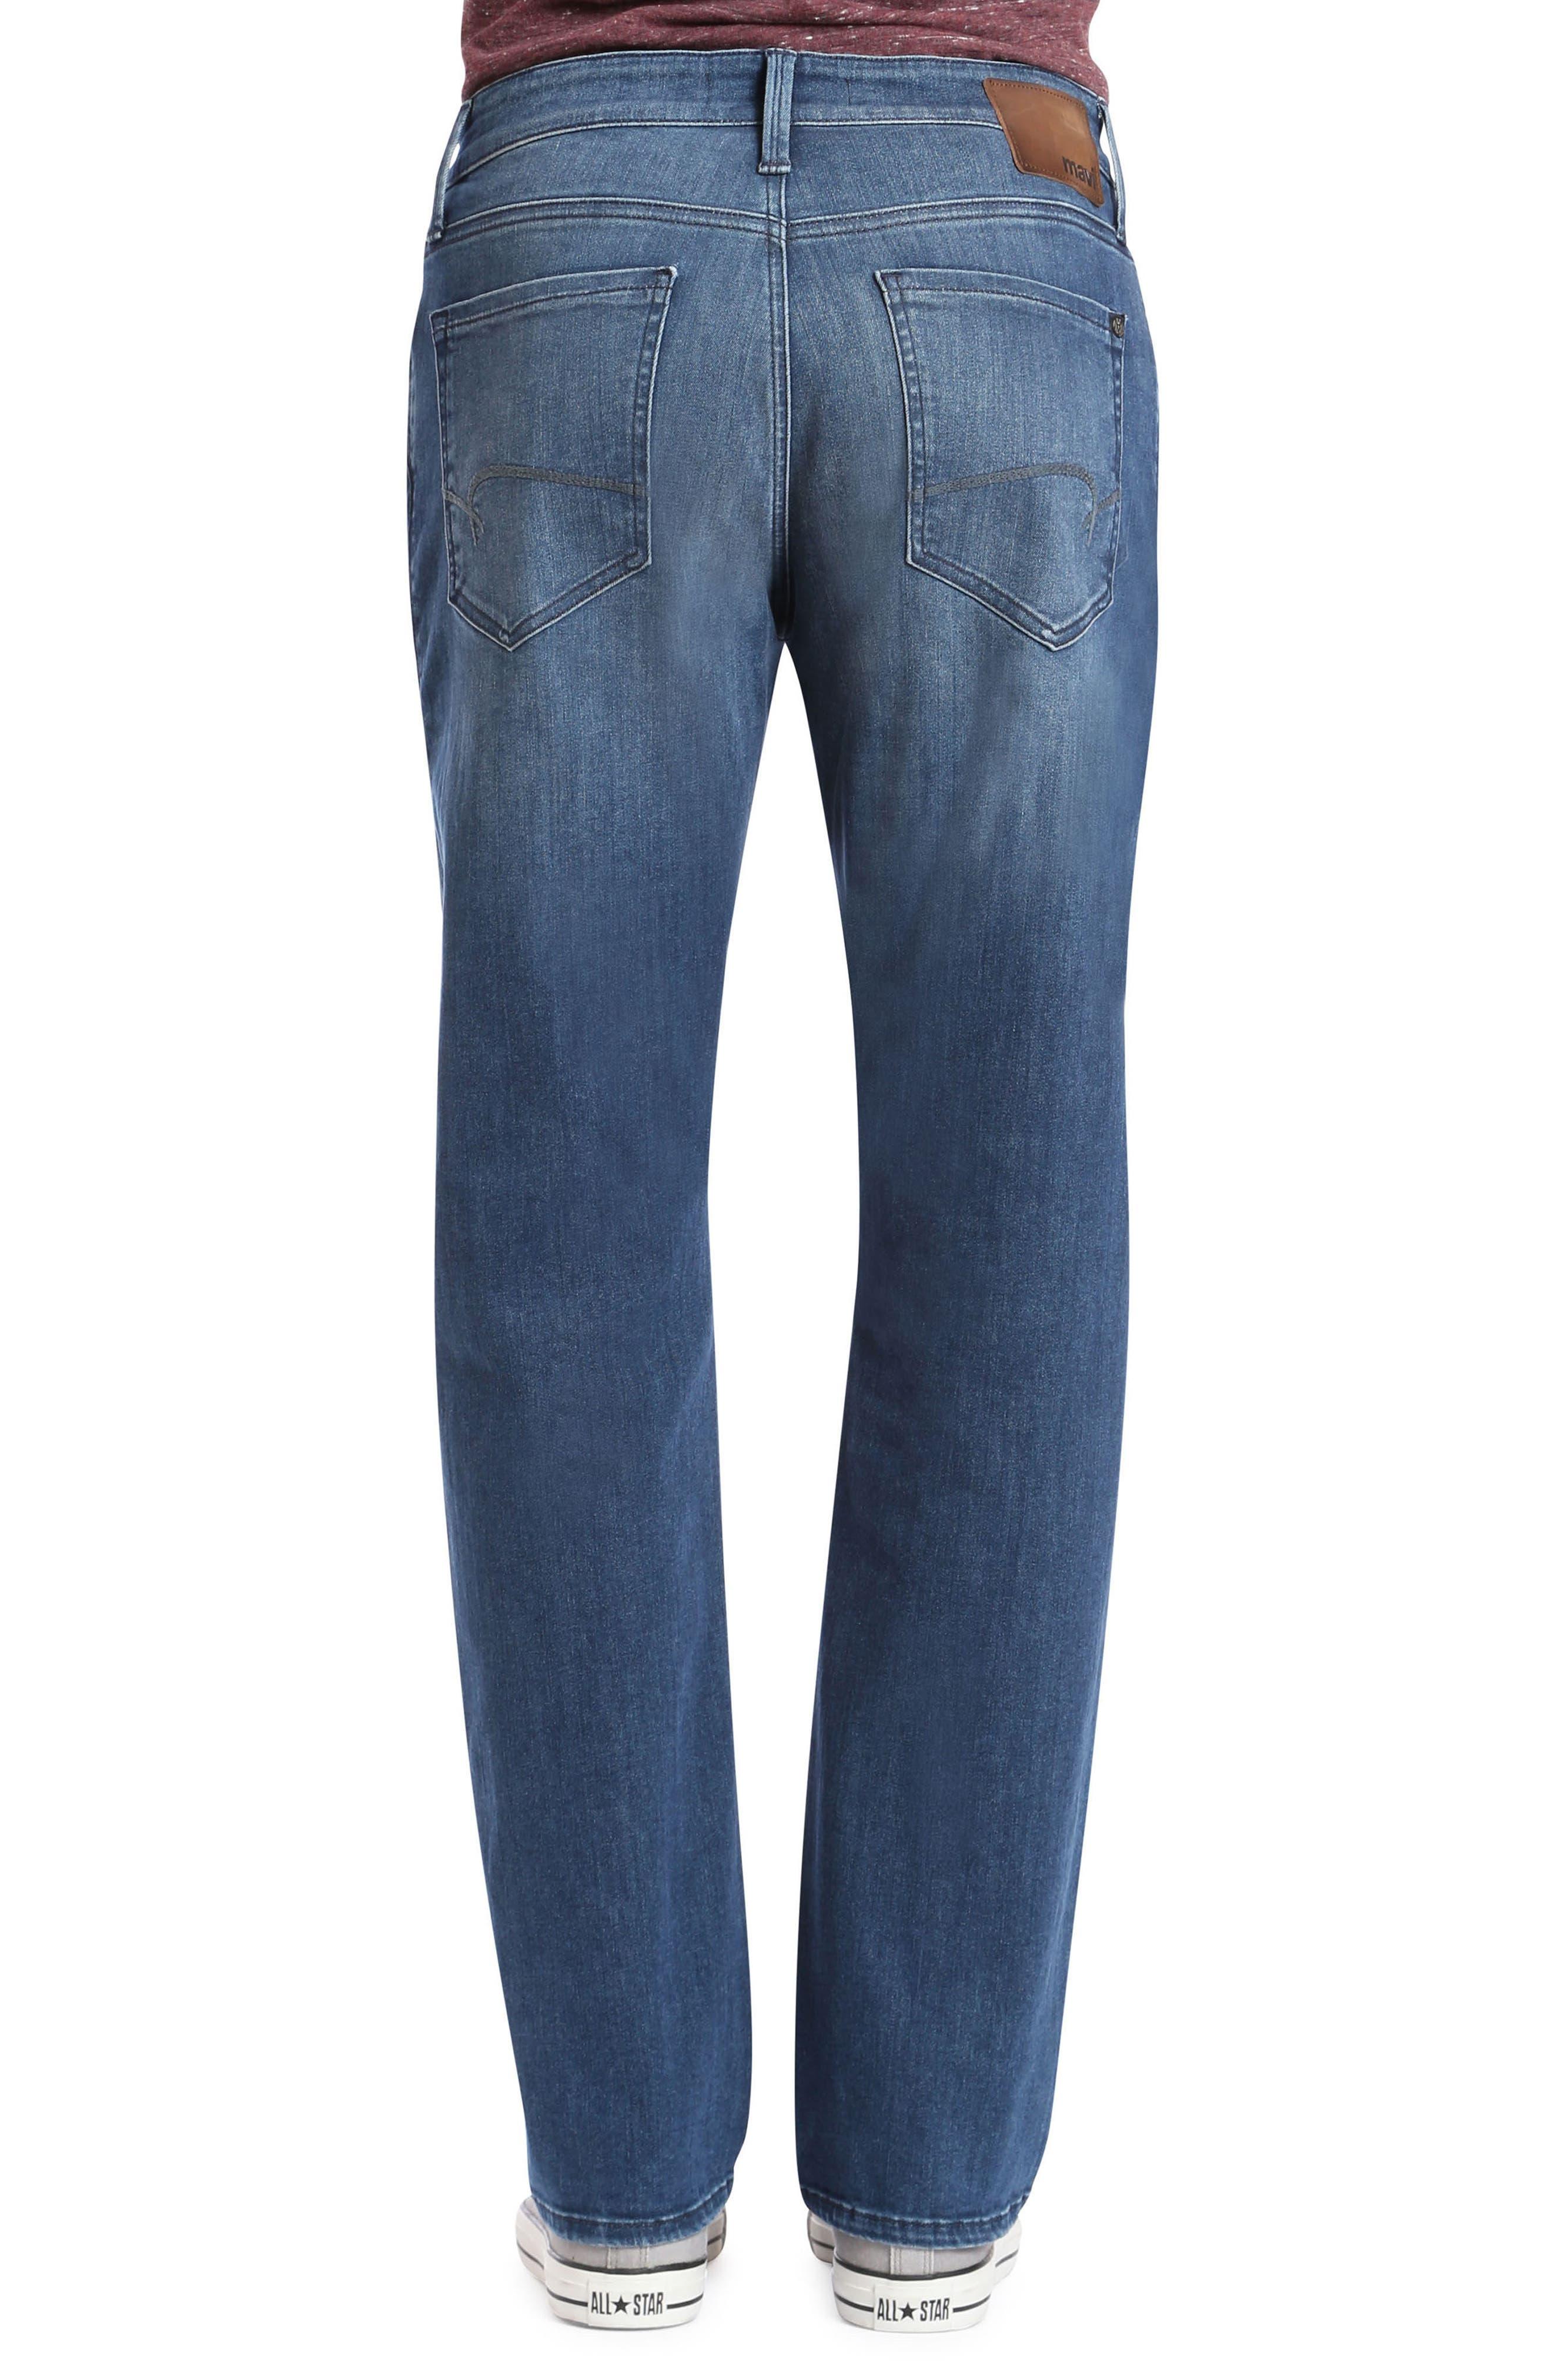 Myles Straight Leg Jeans,                             Alternate thumbnail 2, color,                             400